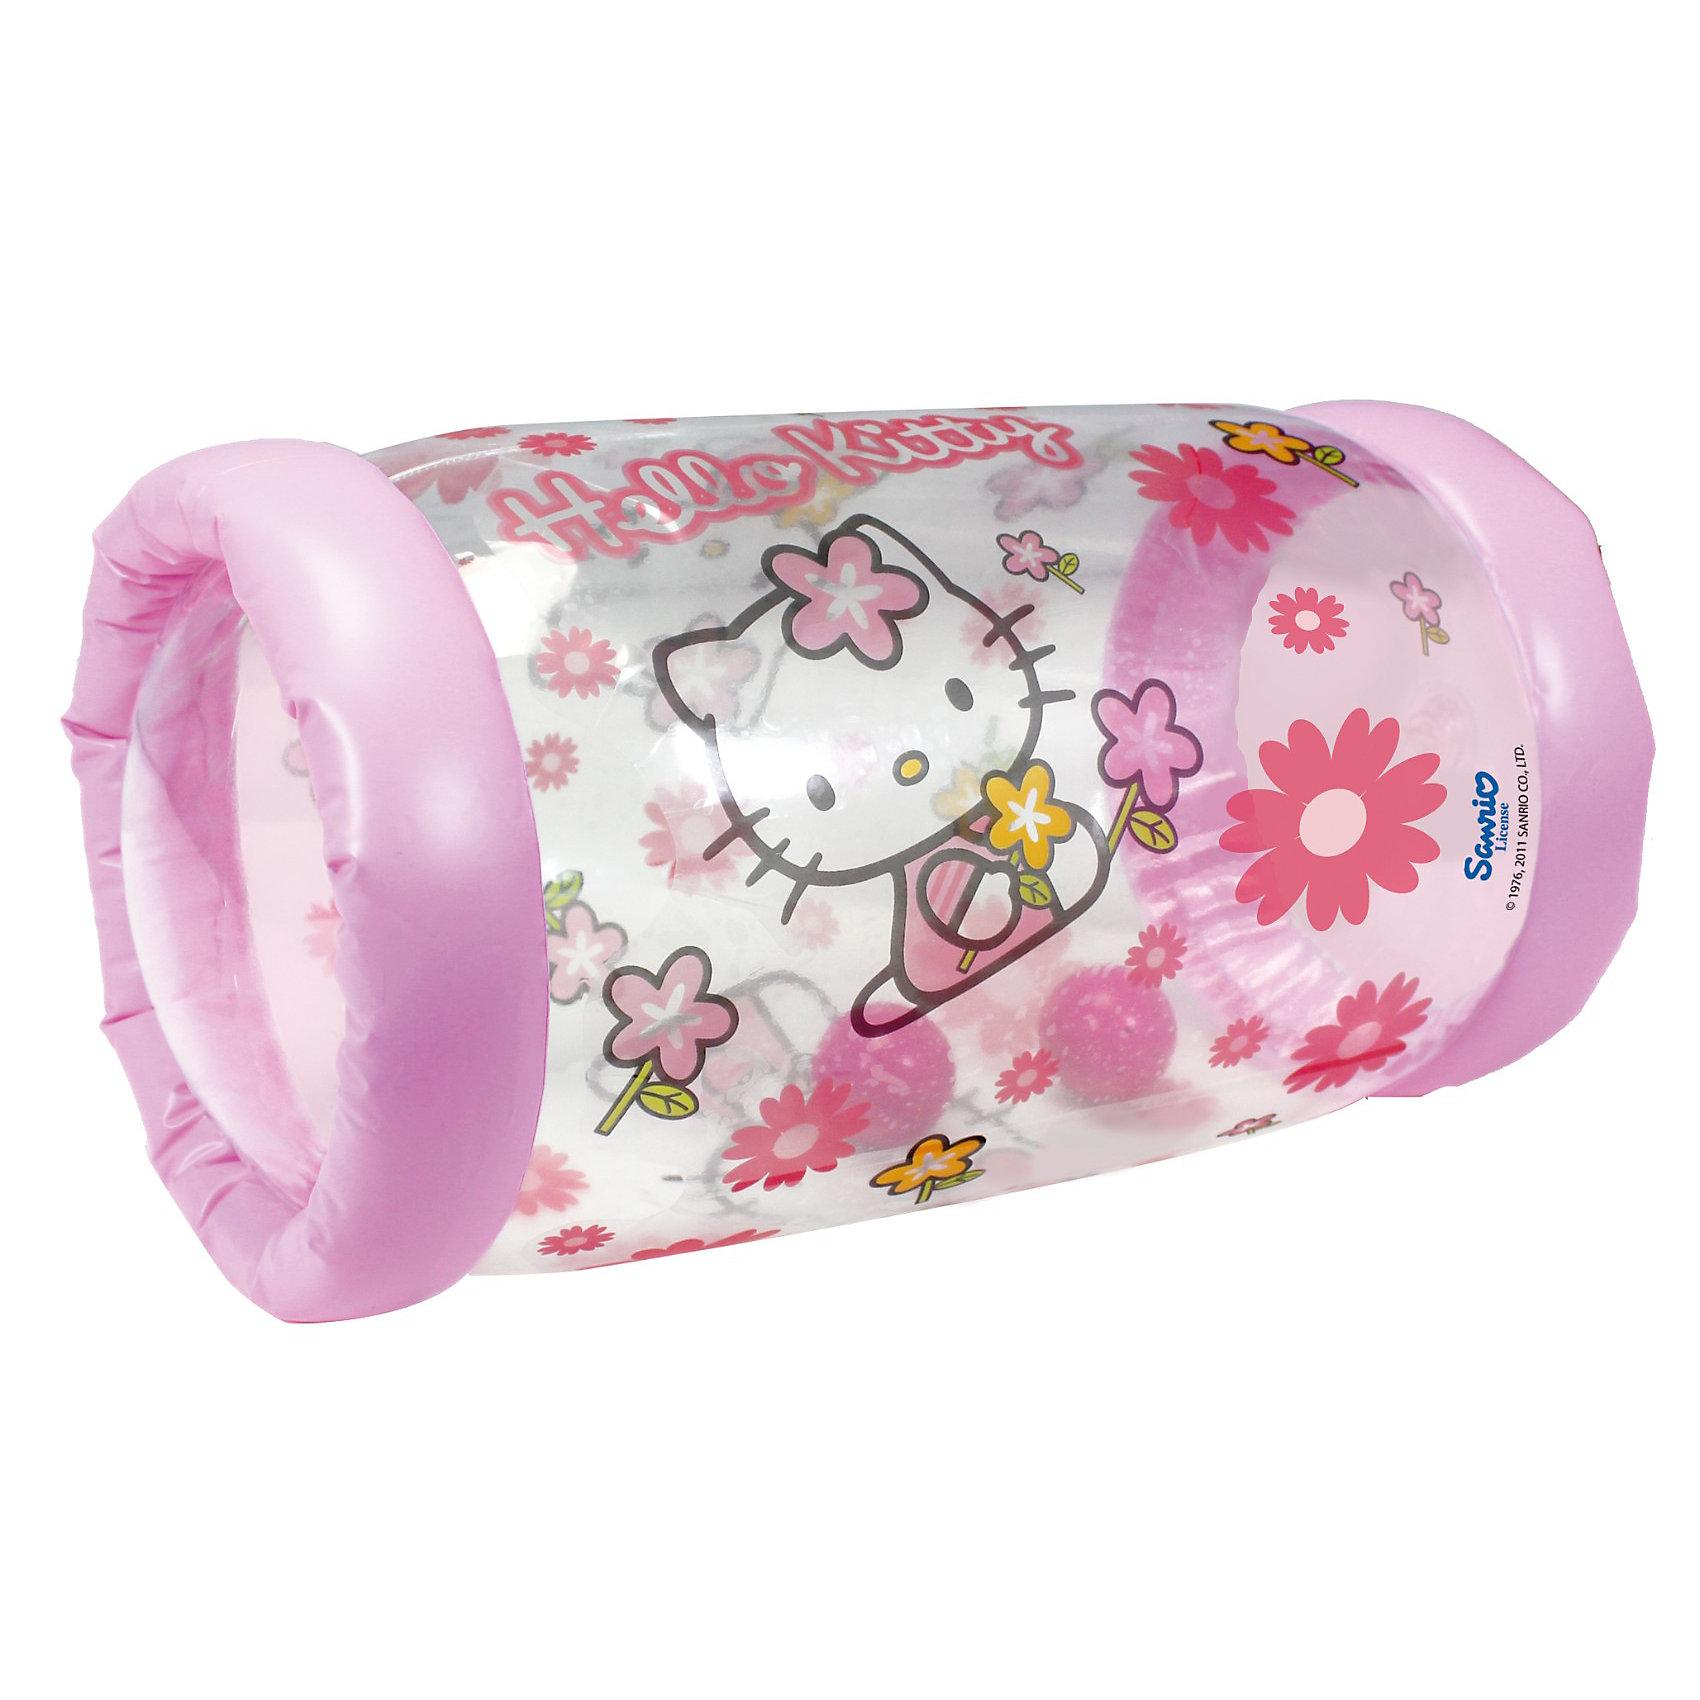 Simba Hello Kitty Надувной цилиндр с 2-я шариками внутри, 42х23 см. simba simba губная гармошка hello kitty